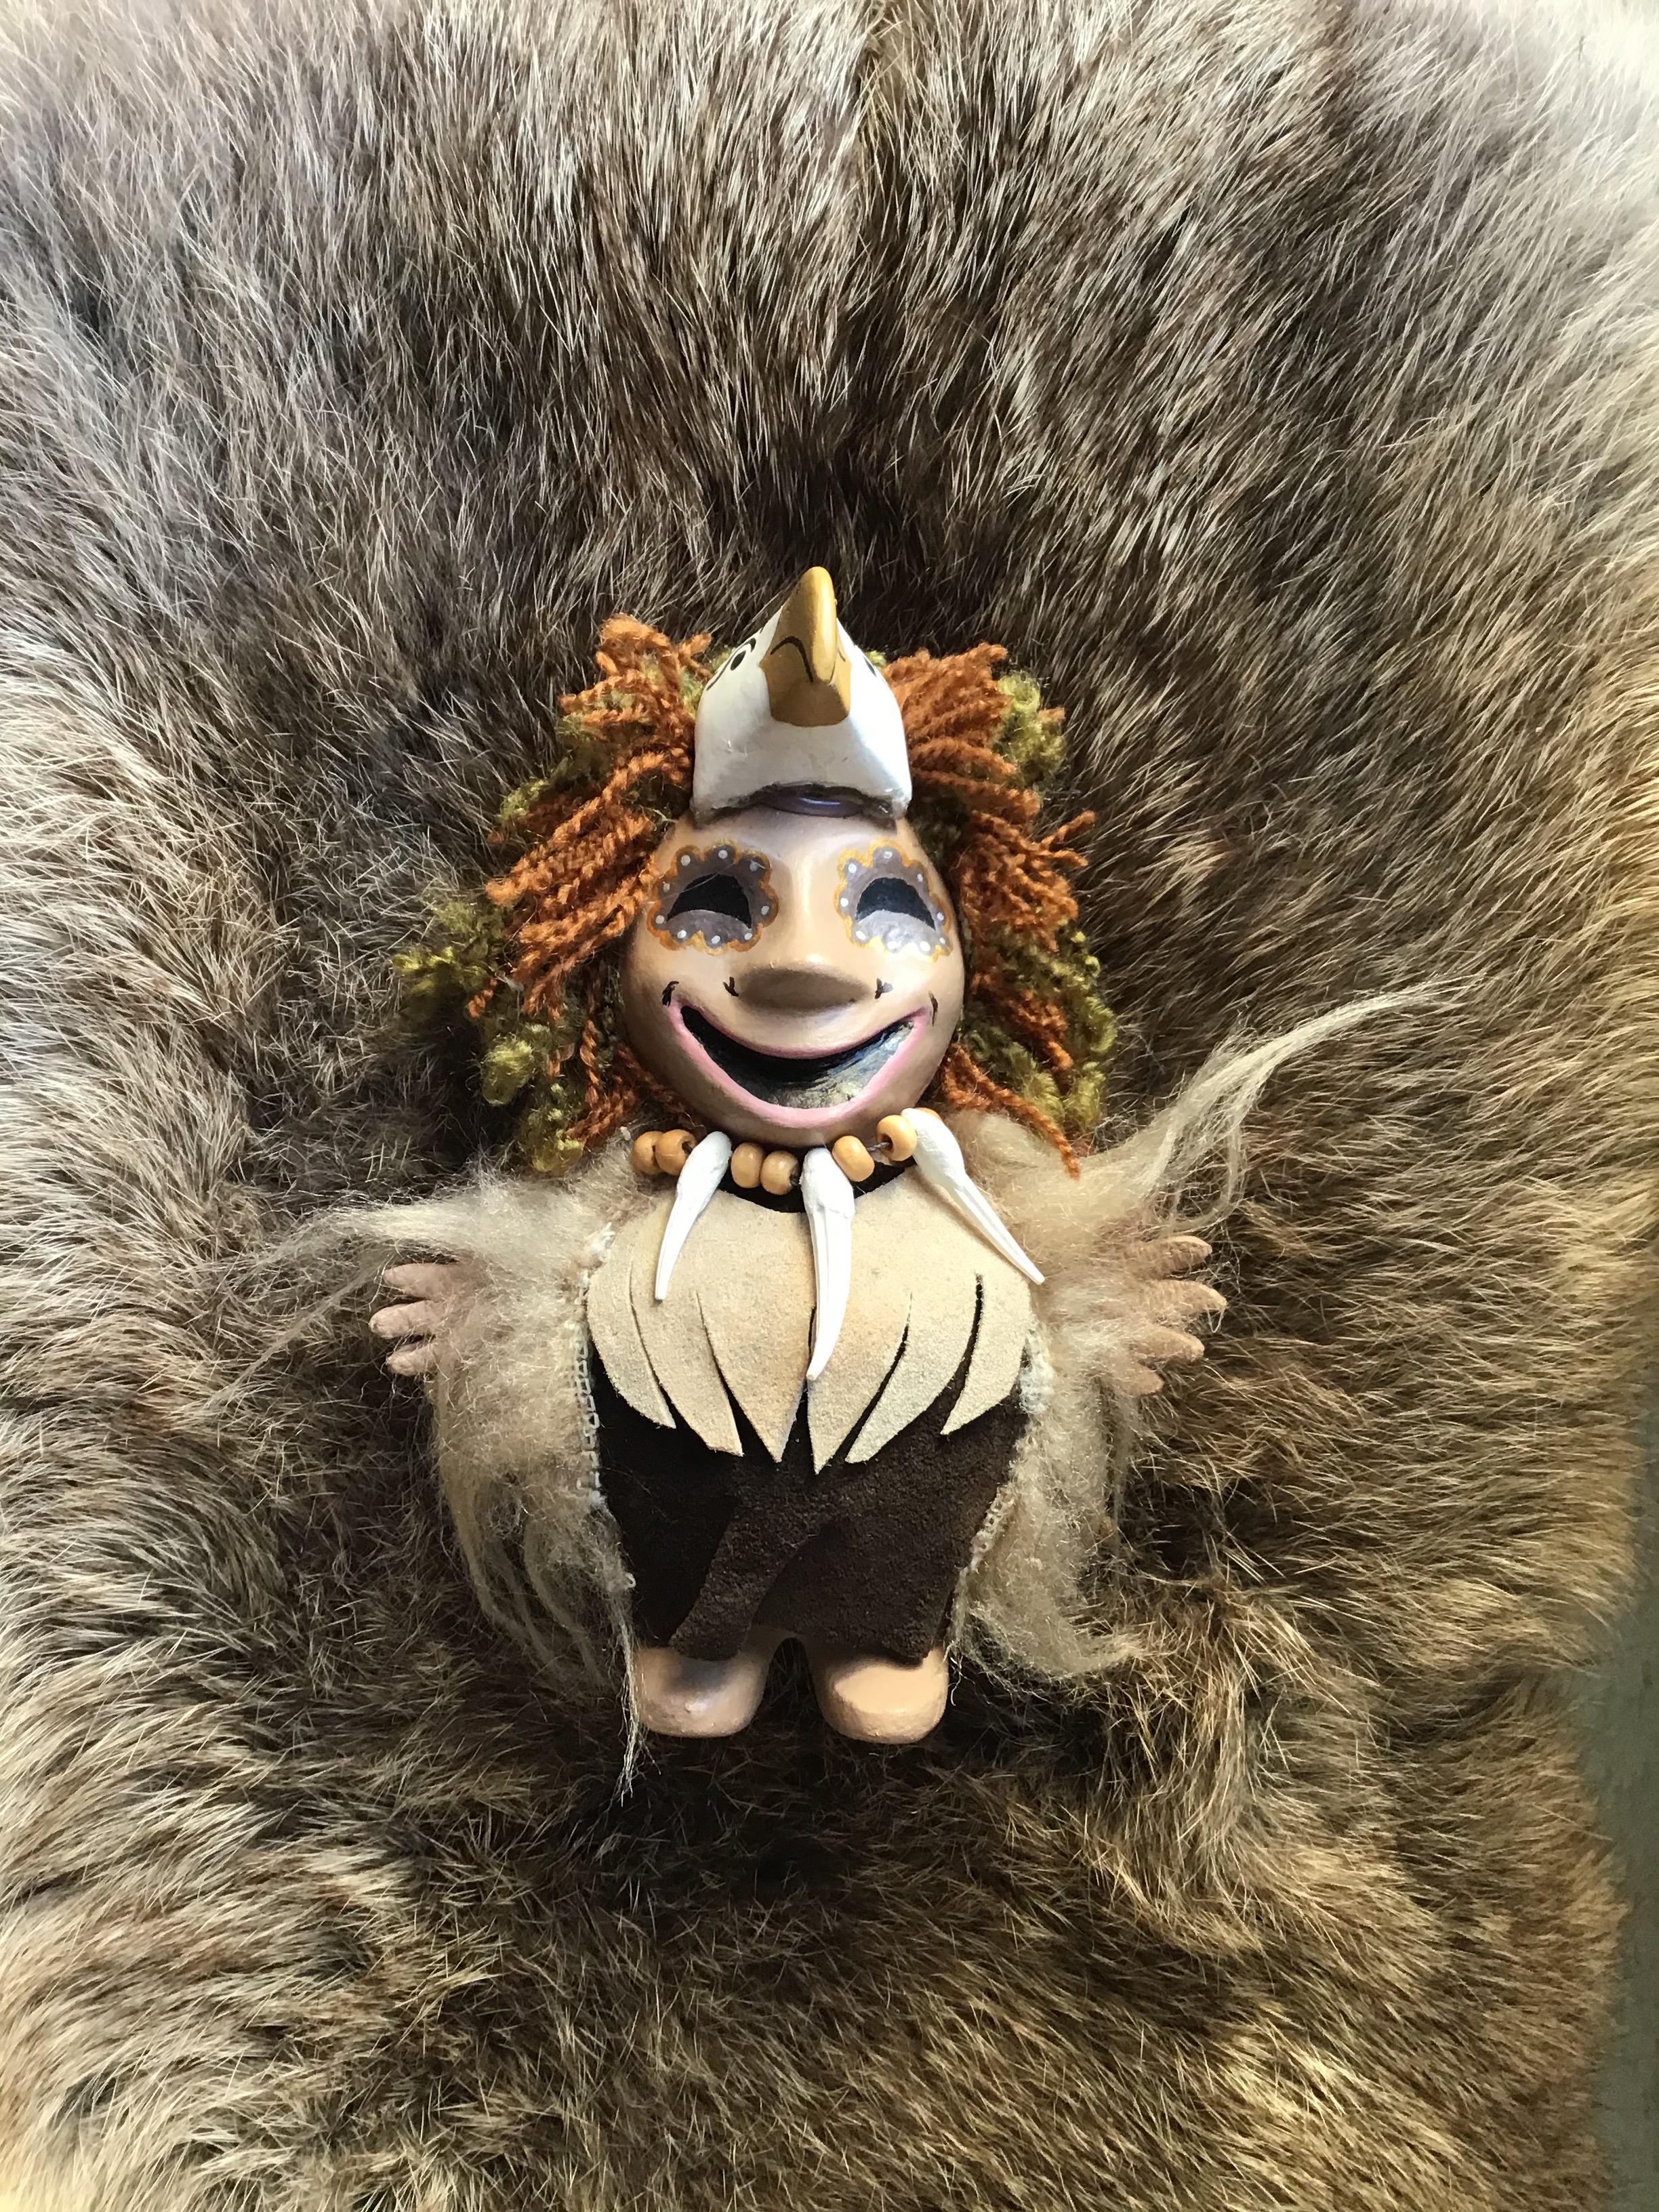 Eagles, figurines, shamans, Alaskan Art, good mood,